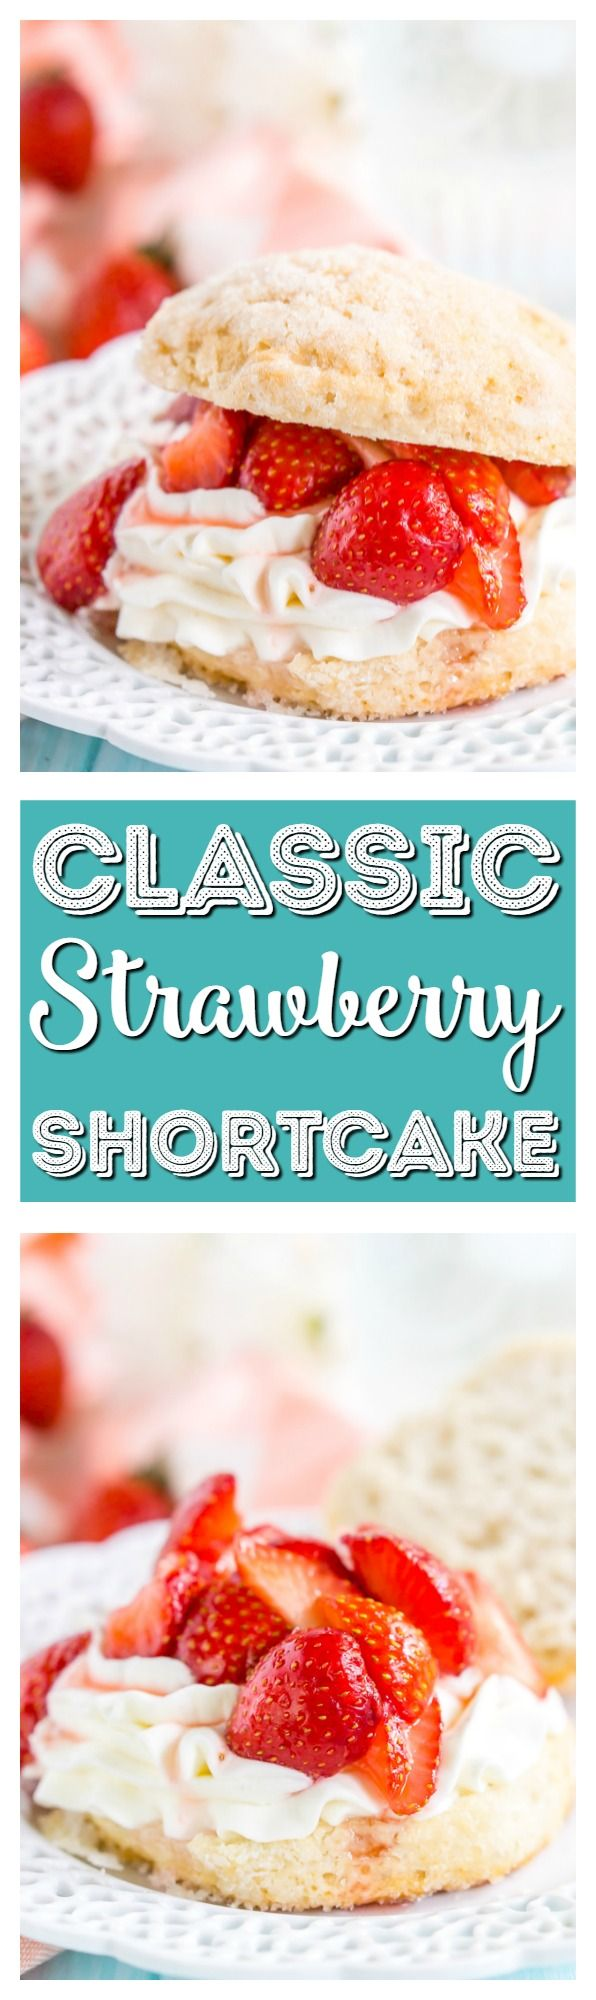 15 best Dessert images on Pinterest | Dessert recipes, Petit fours ...